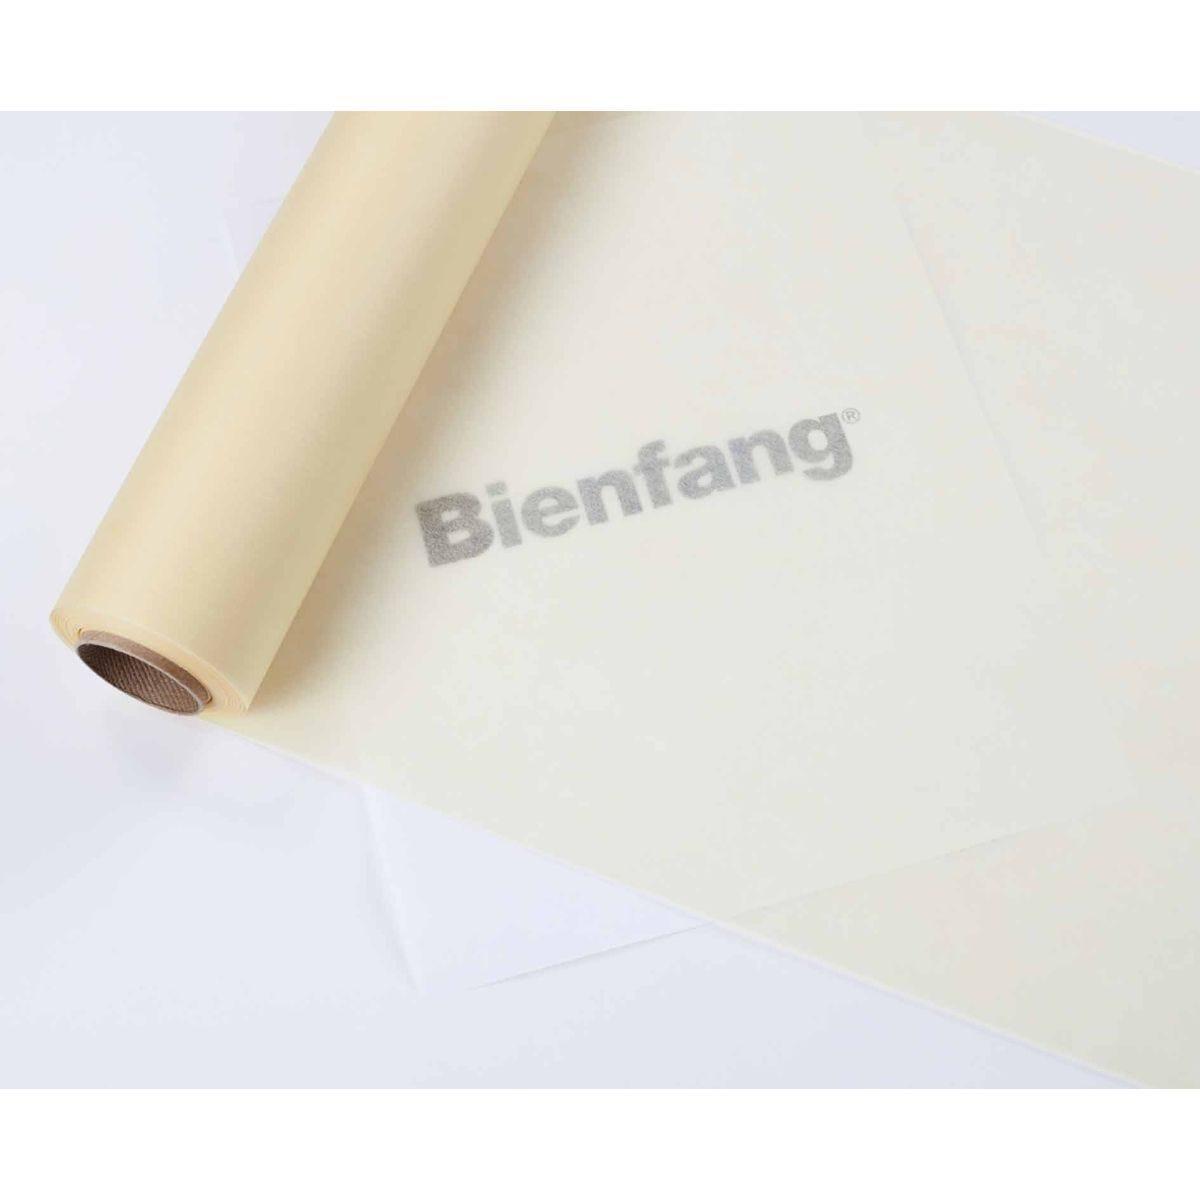 Bienfang Sketching Detail Paper Roll 35gm 304mm x 45.72 Metre Yellow